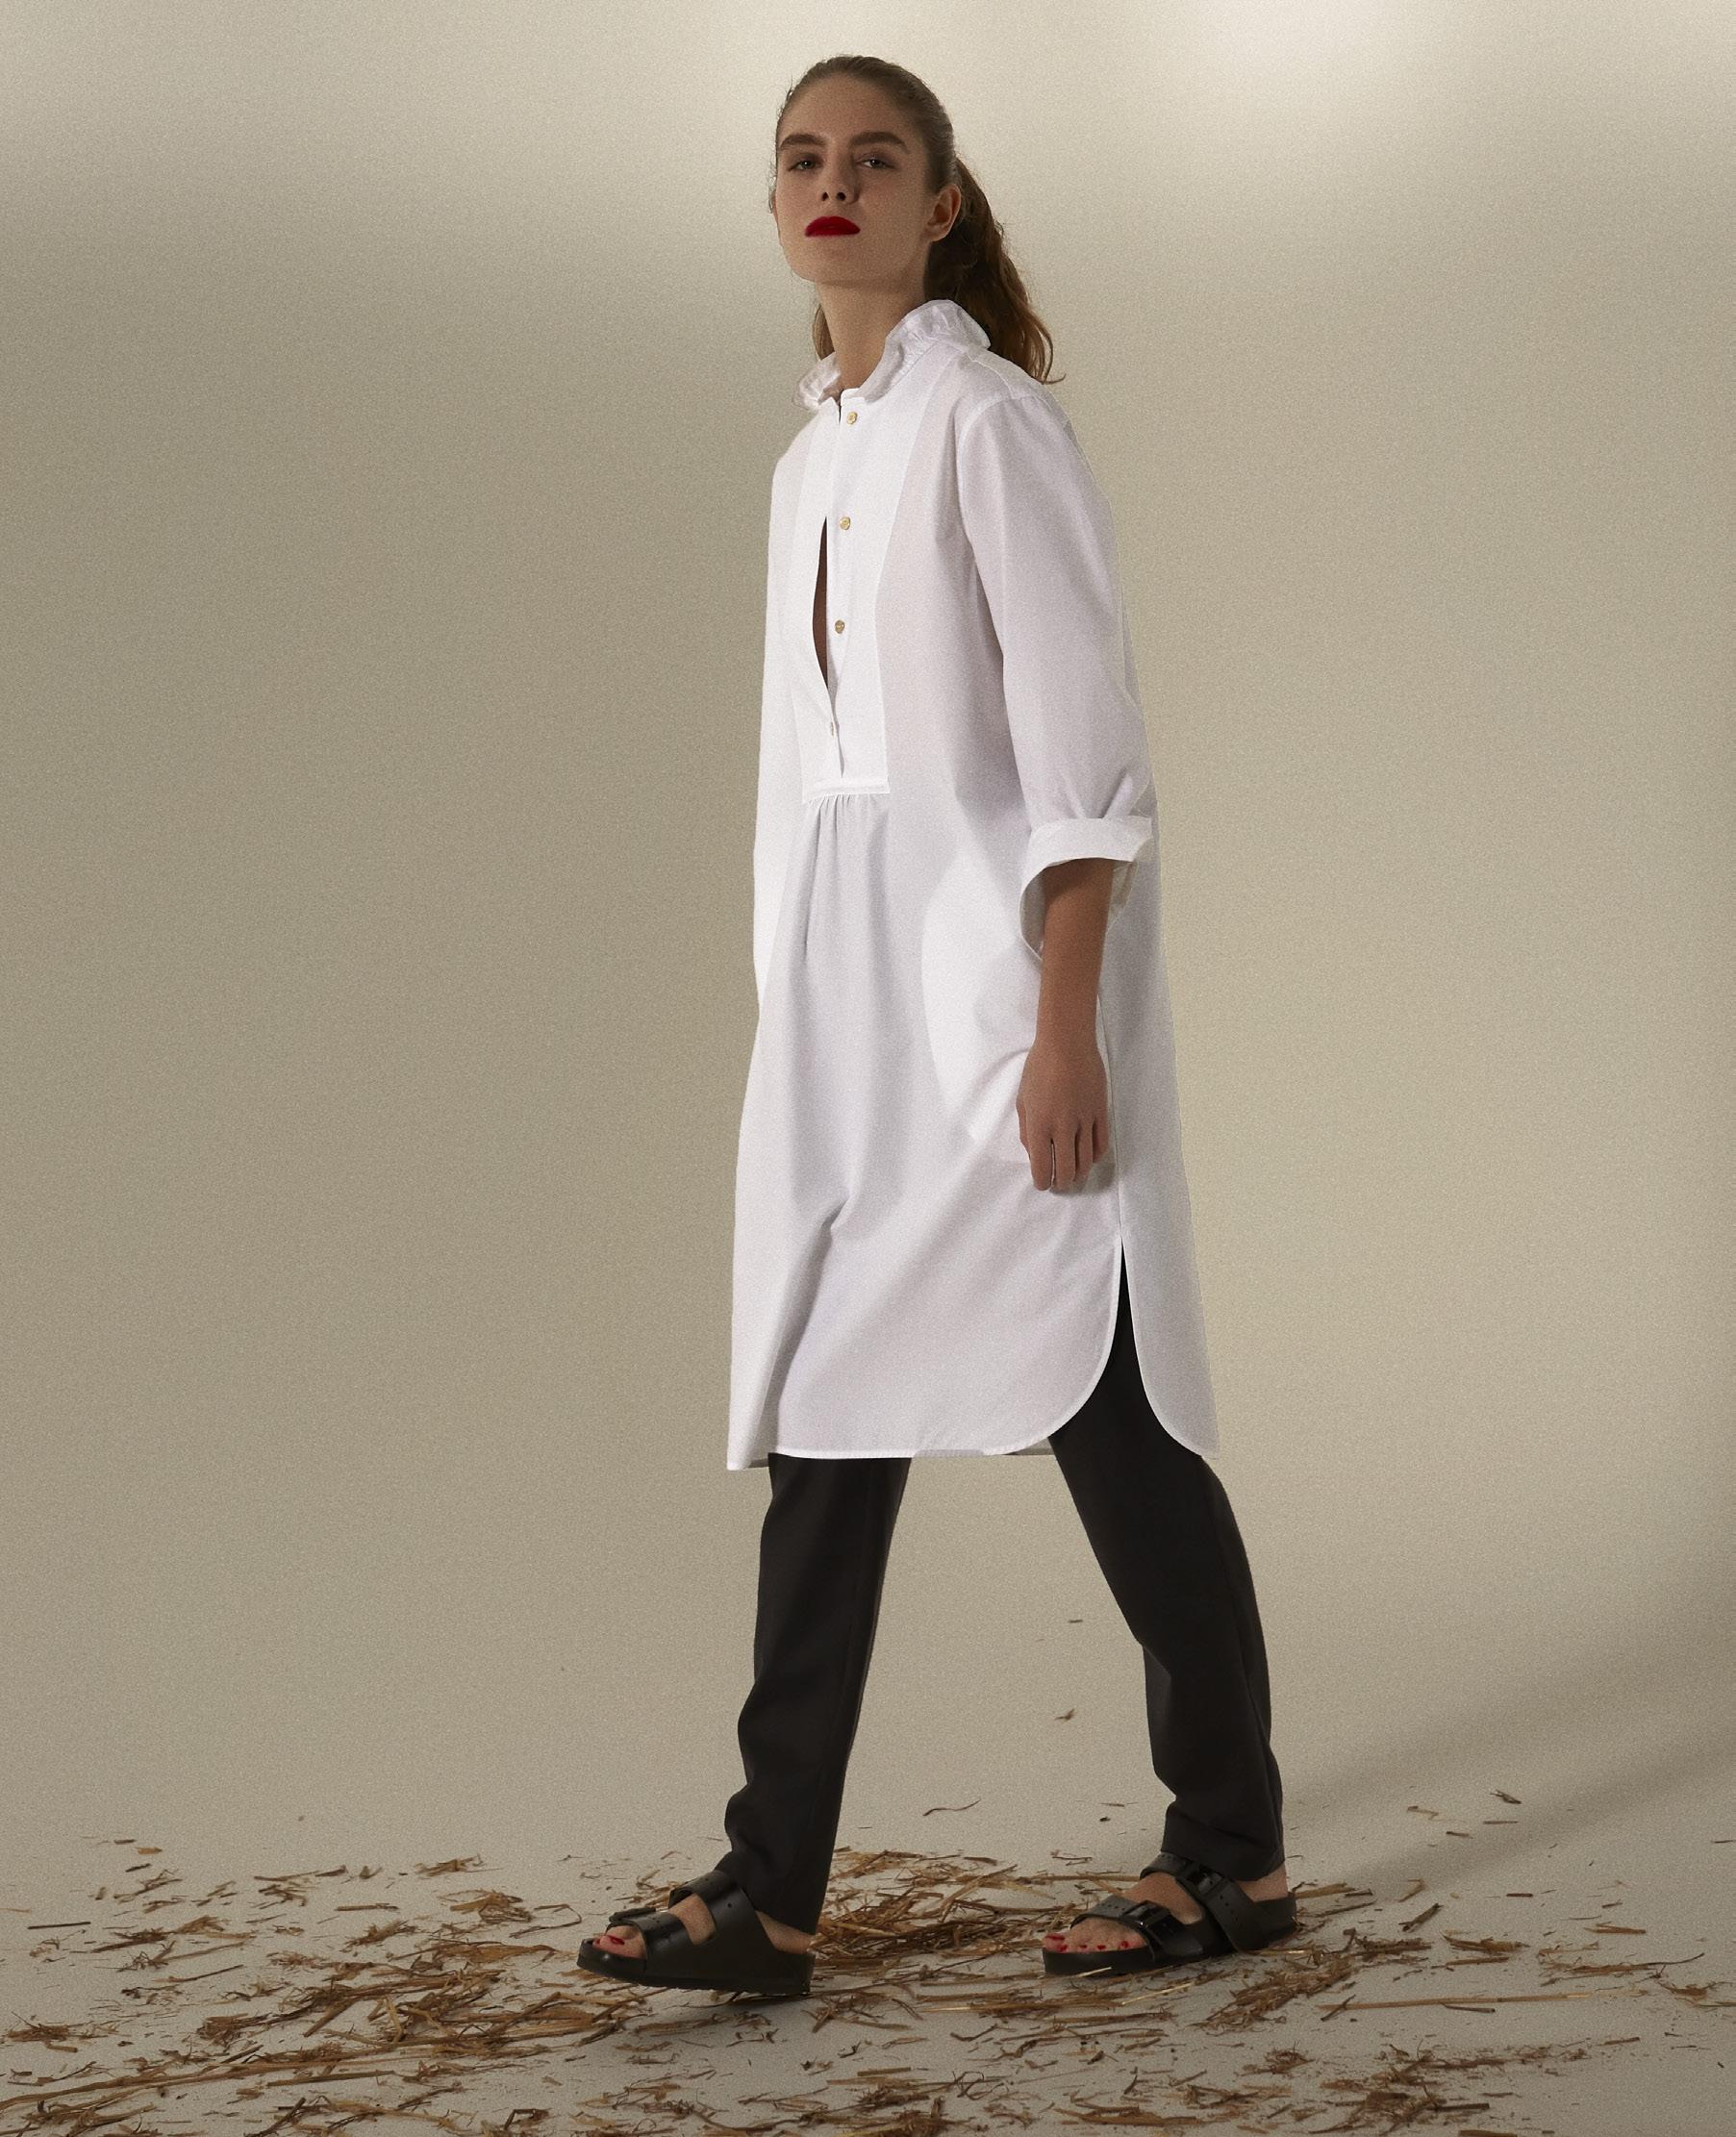 Robe Récit & Pantalon Globe-Trotter